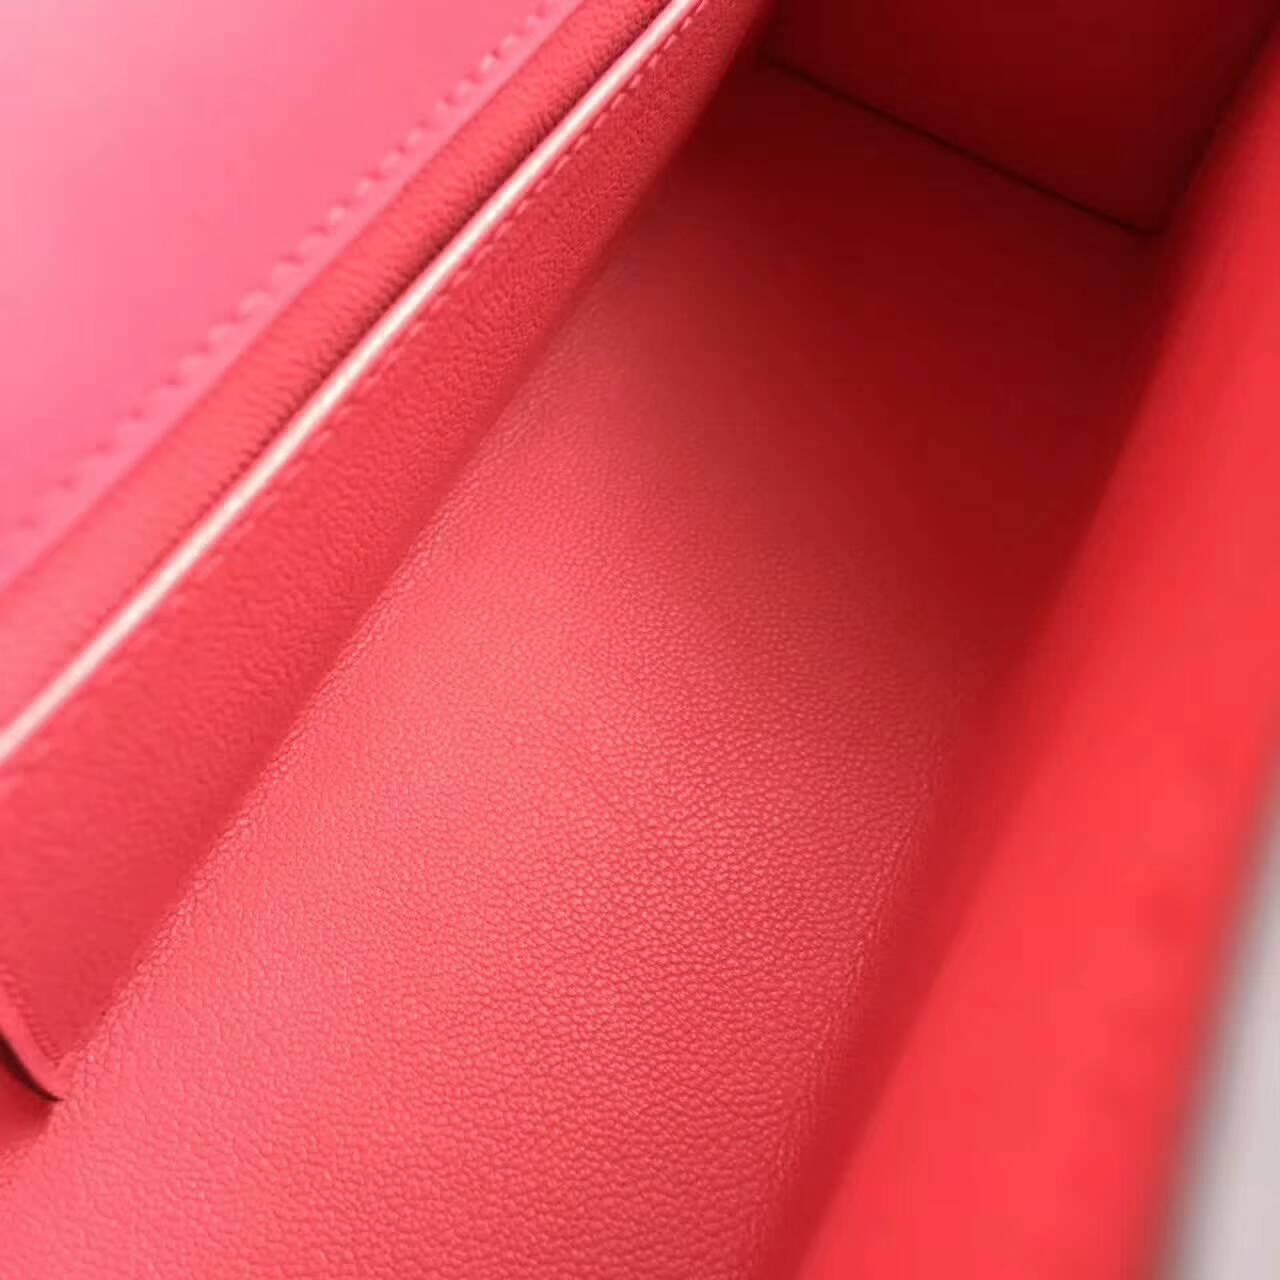 Hermes爱马仕 Mini Kelly pochette 22cm Swift 法国原产平纹小牛皮 8W Rose Azalee 唇膏粉 银扣